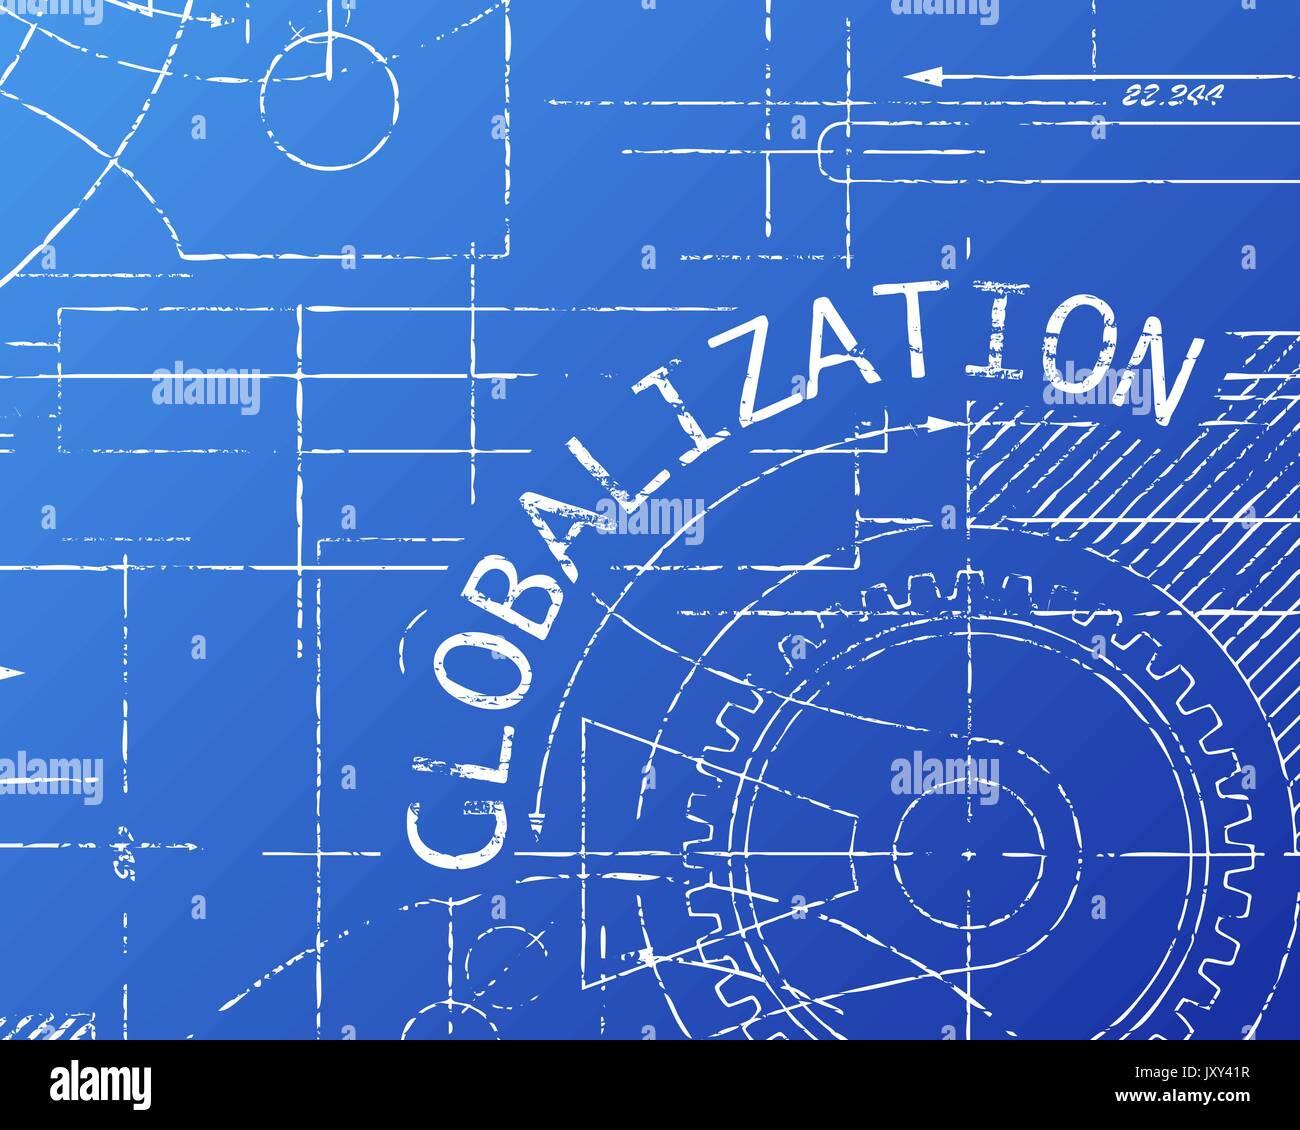 Globalization word on machine blueprint background illustration globalization word on machine blueprint background illustration malvernweather Gallery